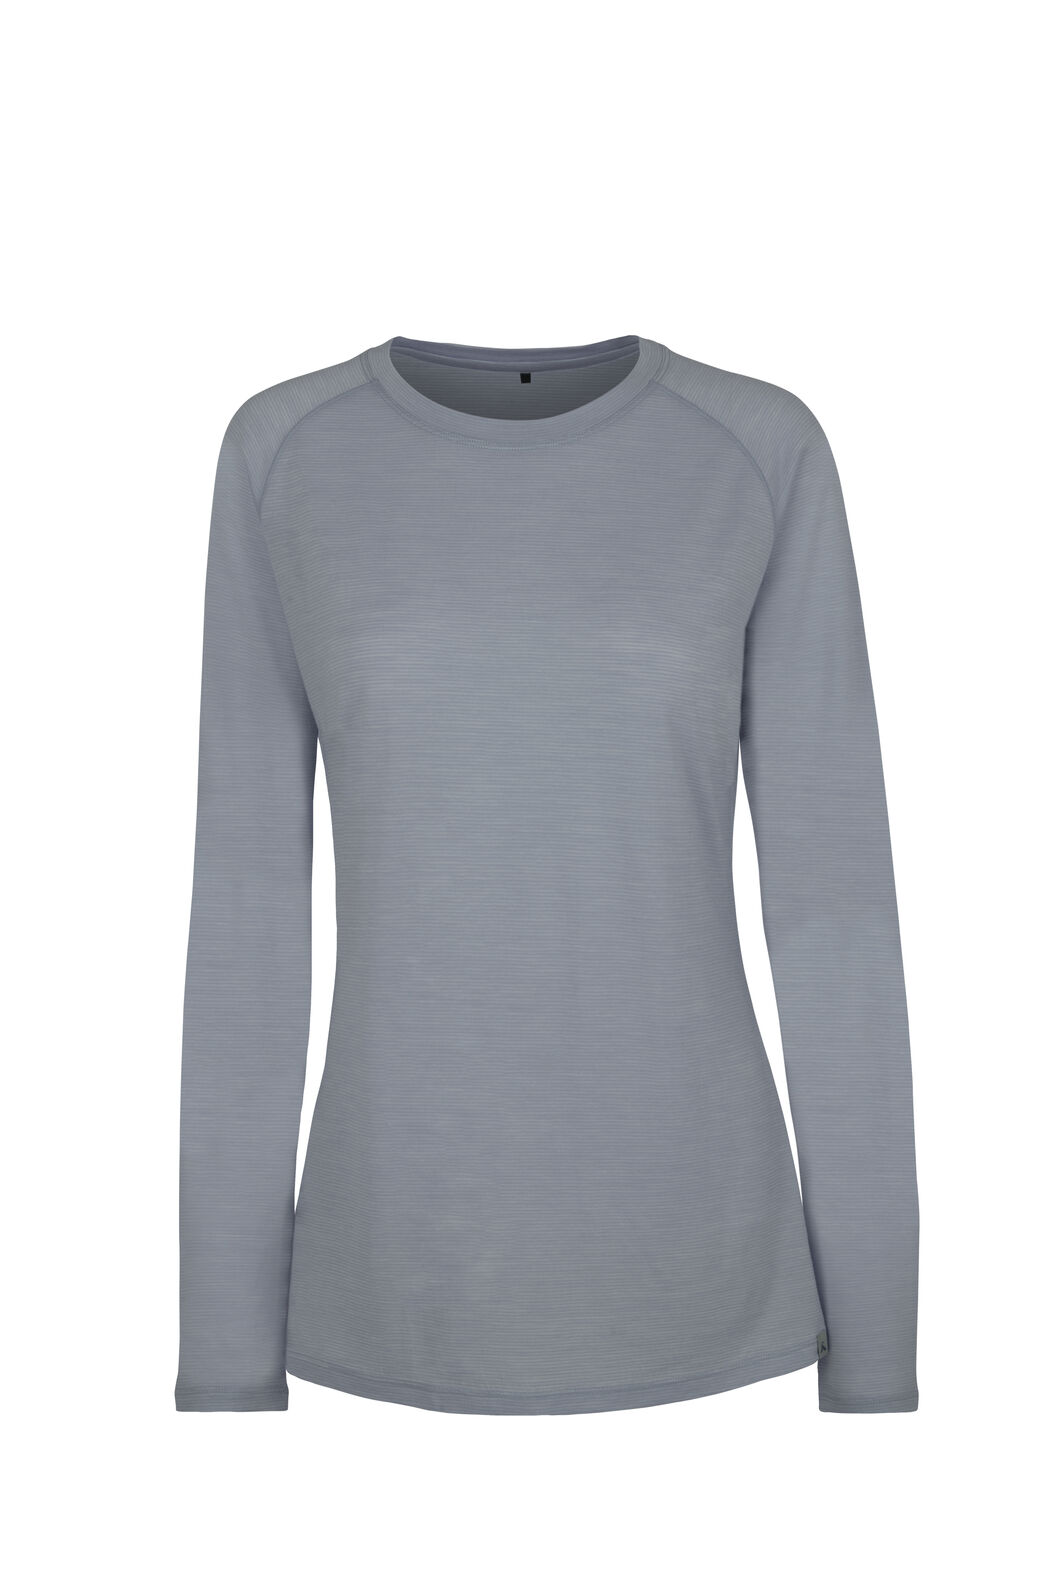 Macpac Hyland Merino Blend Long Sleeve - Women's, Pearl Blue, hi-res